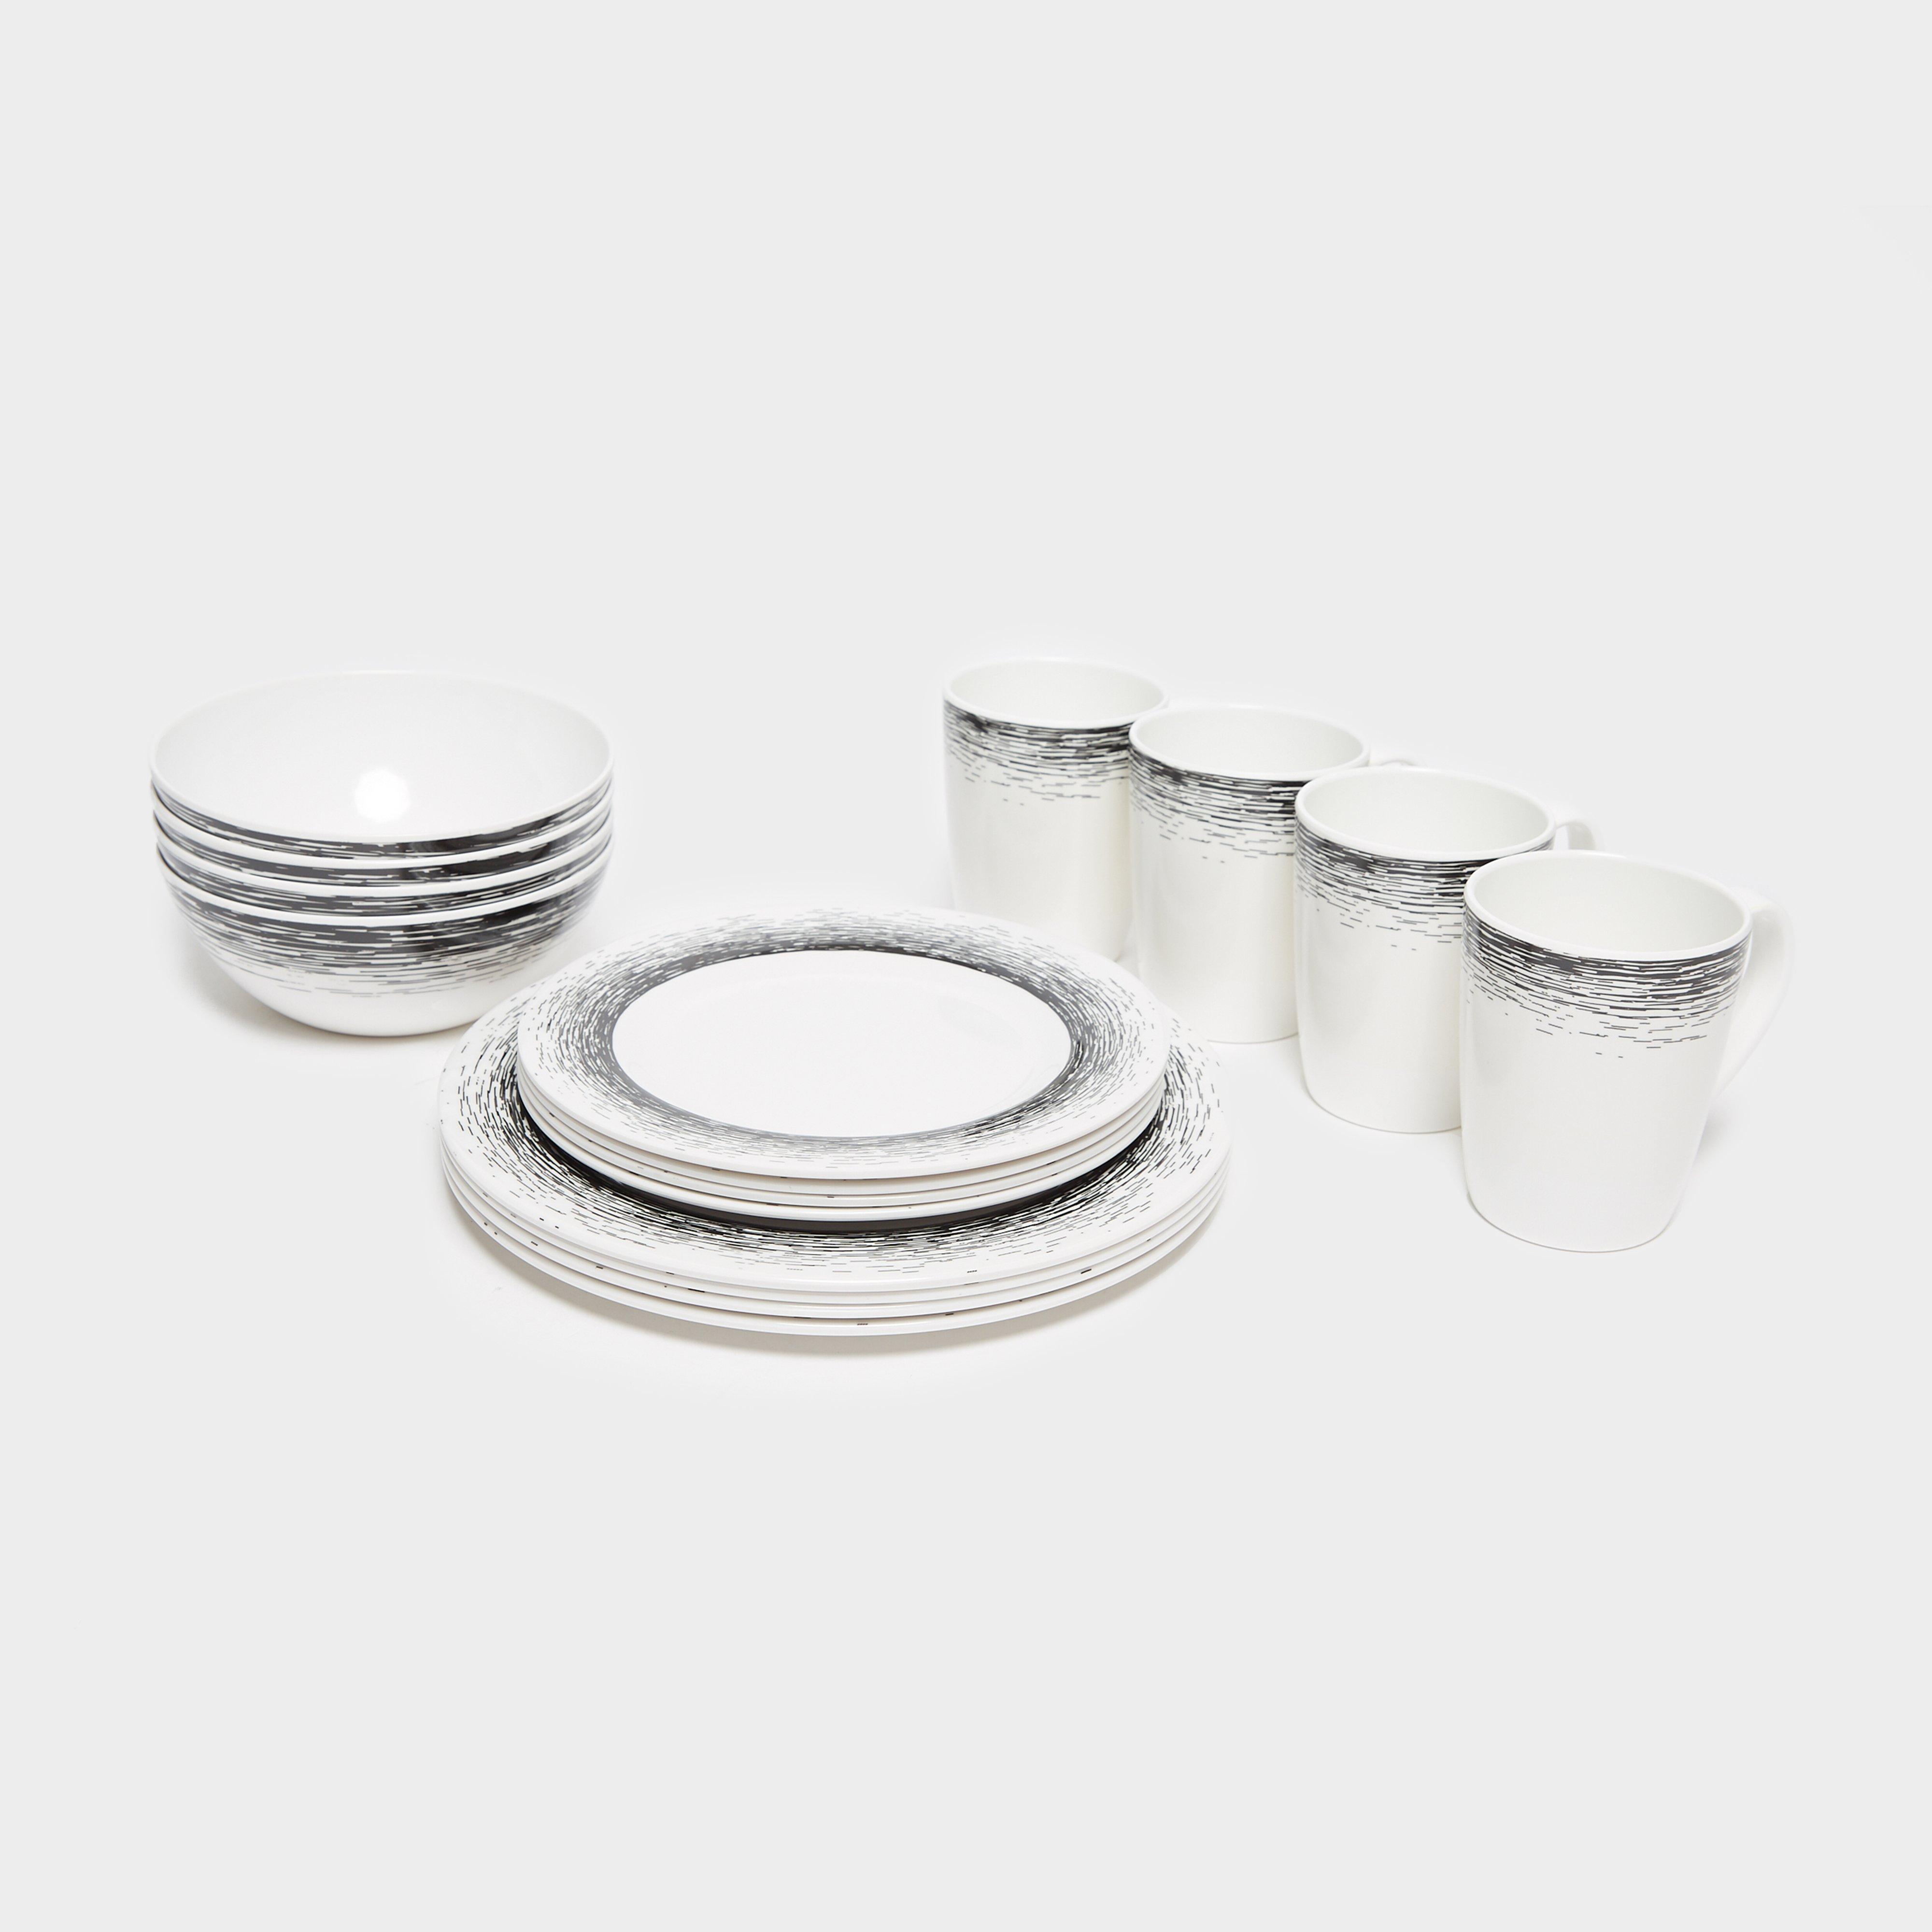 HI-GEAR 16 Piece Melamine Plastic Tableware Set, White/White